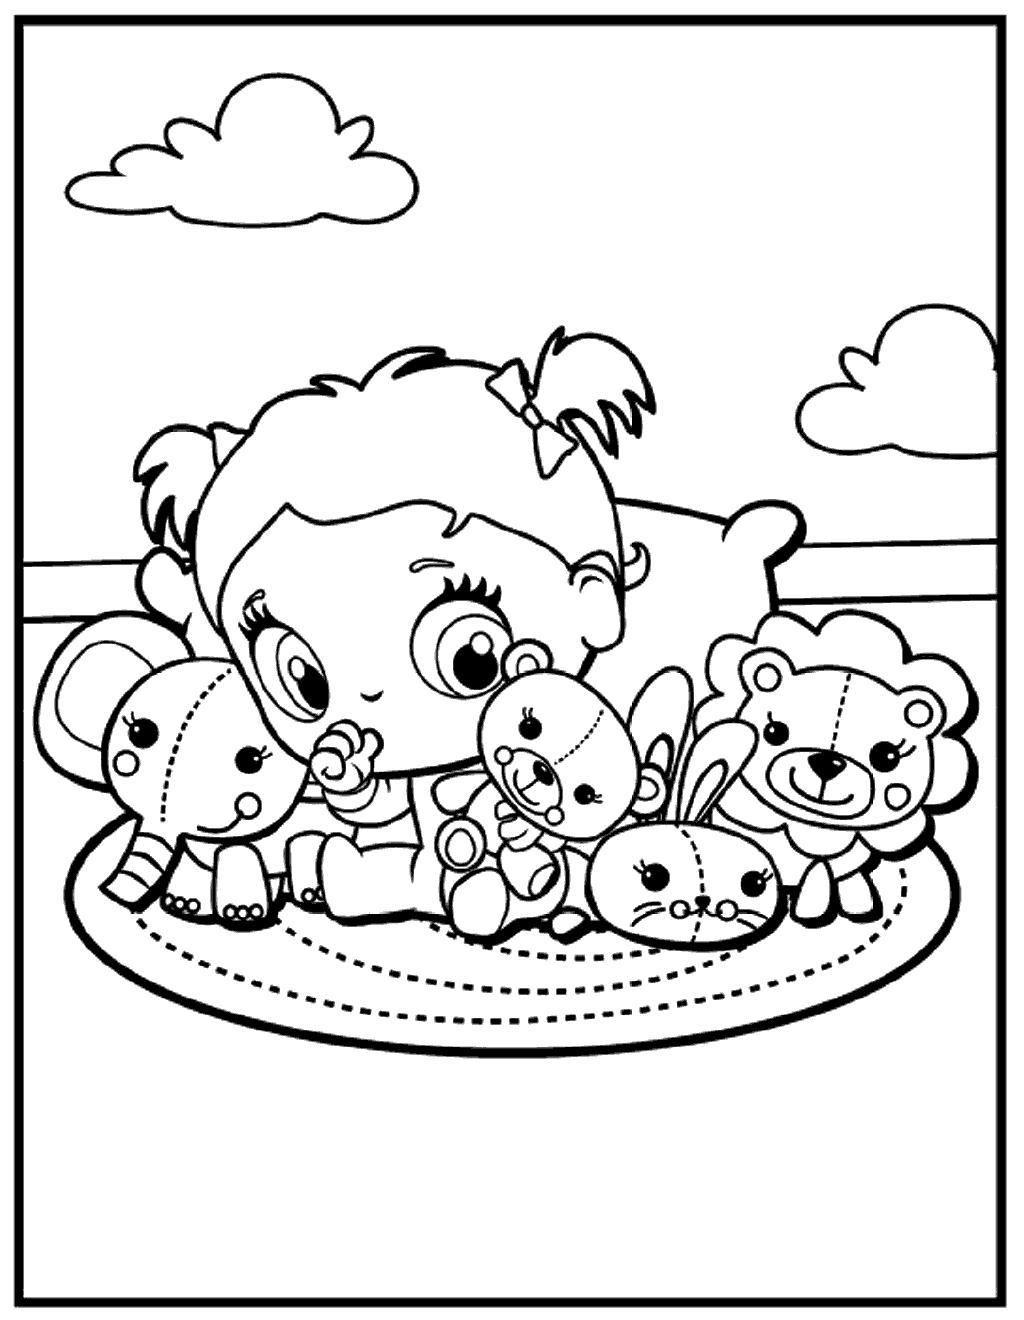 1024x1320 Kawaii Animals And Cute Girl Coloring Page